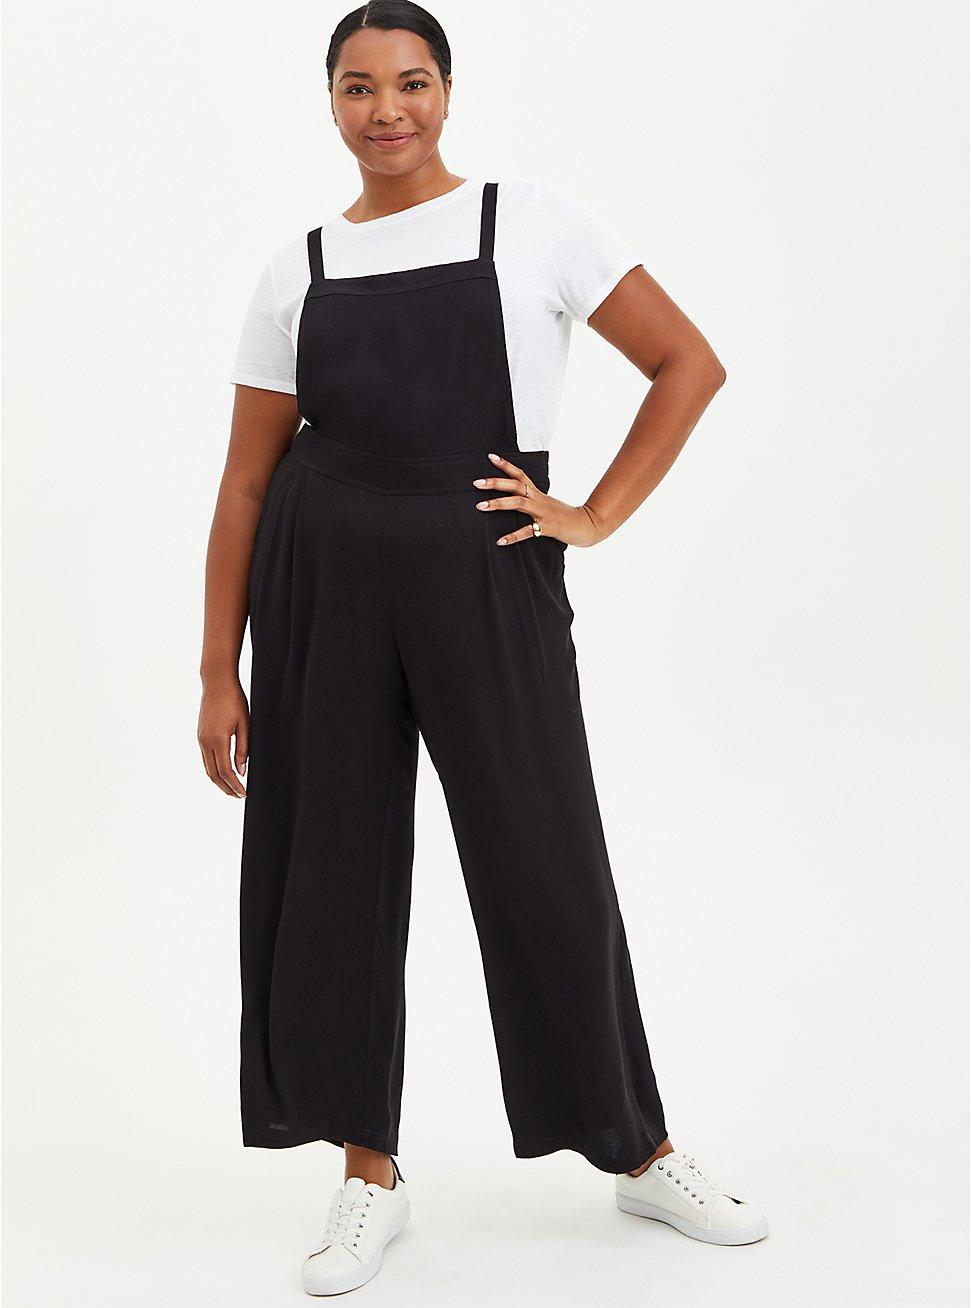 Wide Leg Jumpsuit - Crepe Black, DEEP BLACK, hi-res